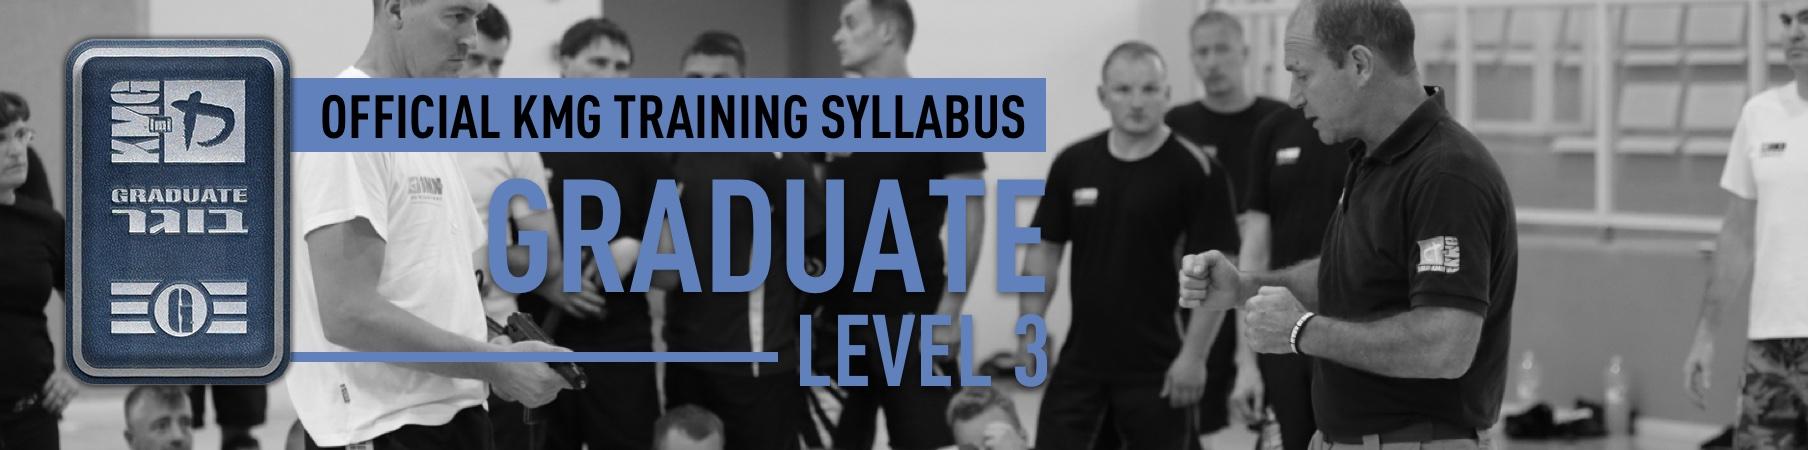 G3 Training Program Introduction A Word From Eyal MaxKravMaga